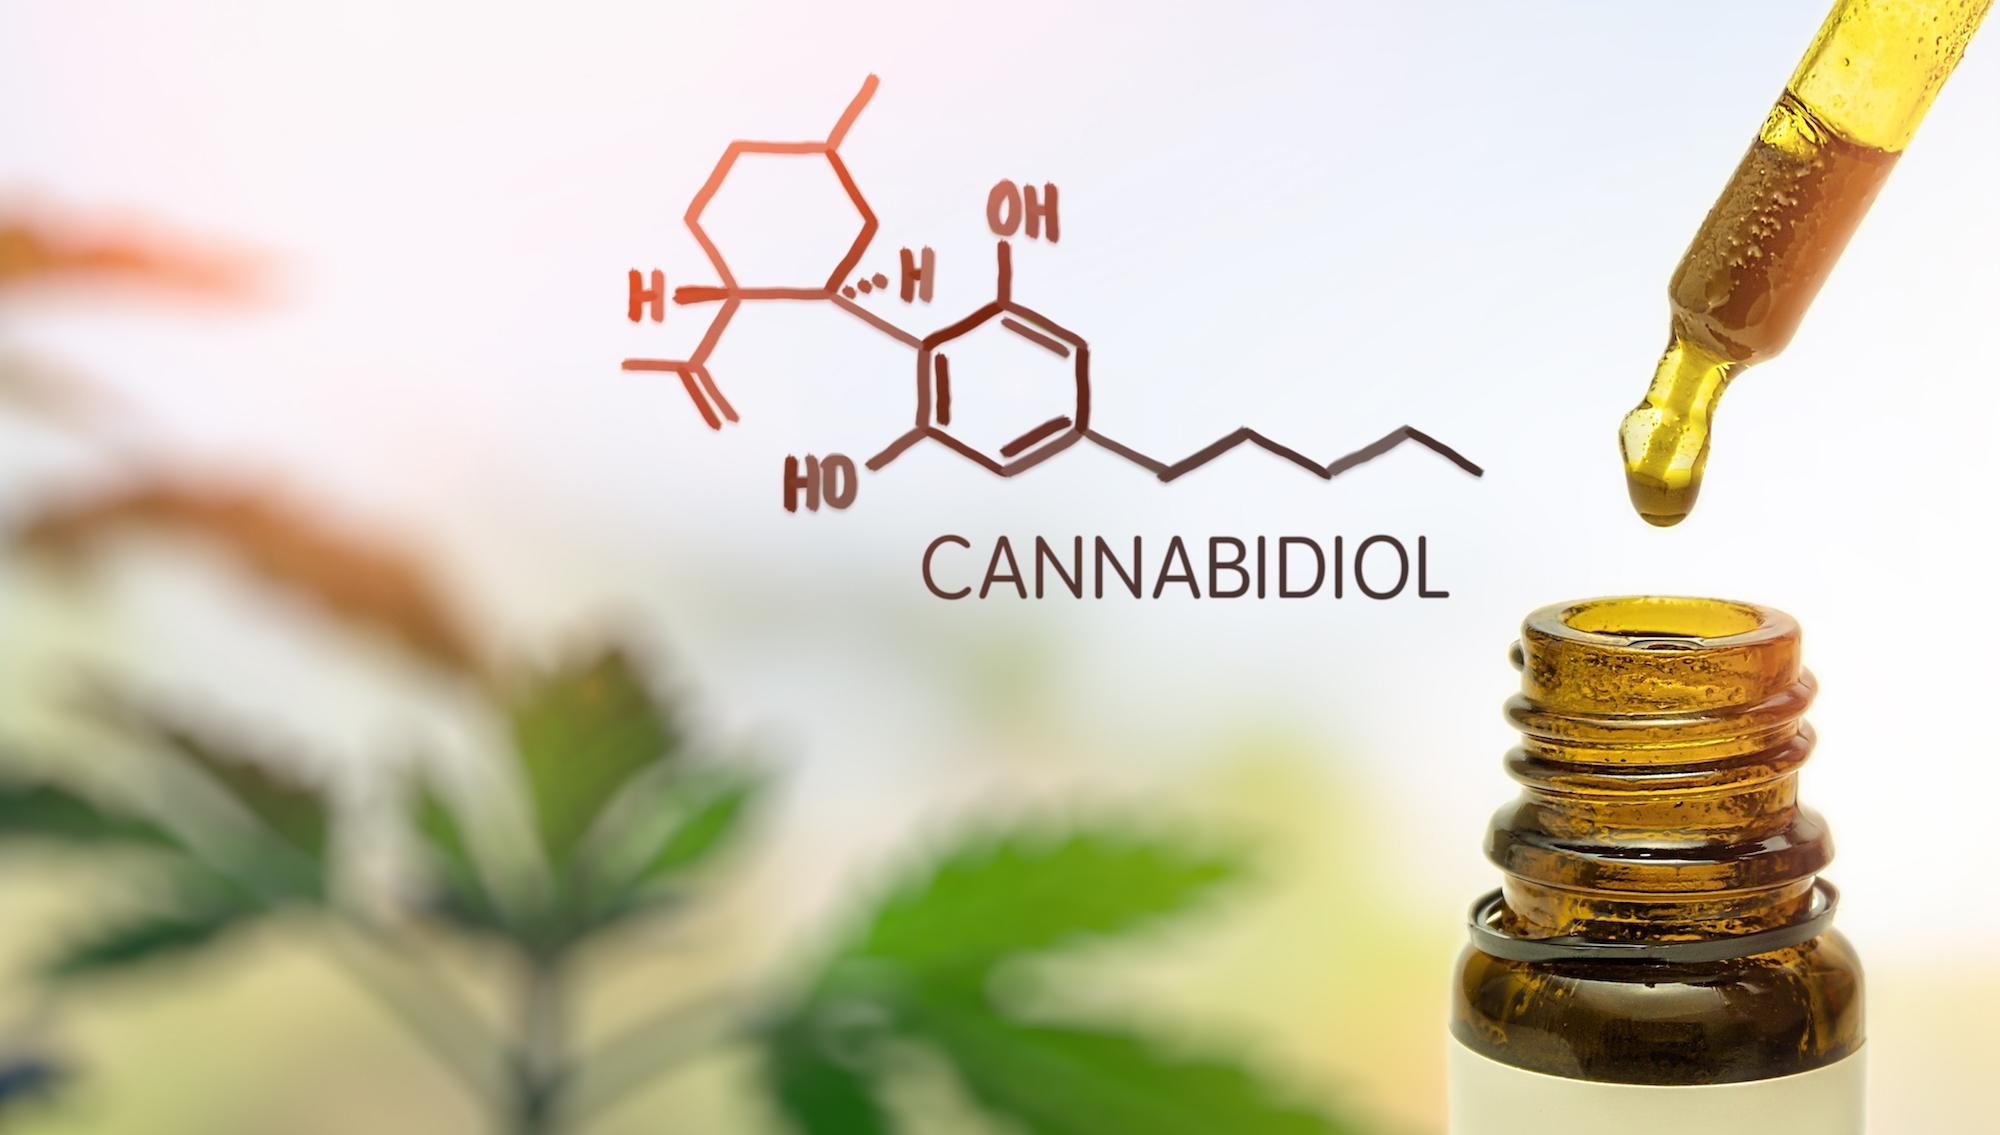 Cannabidiol (CBD) Wirkung bei Krankheiten